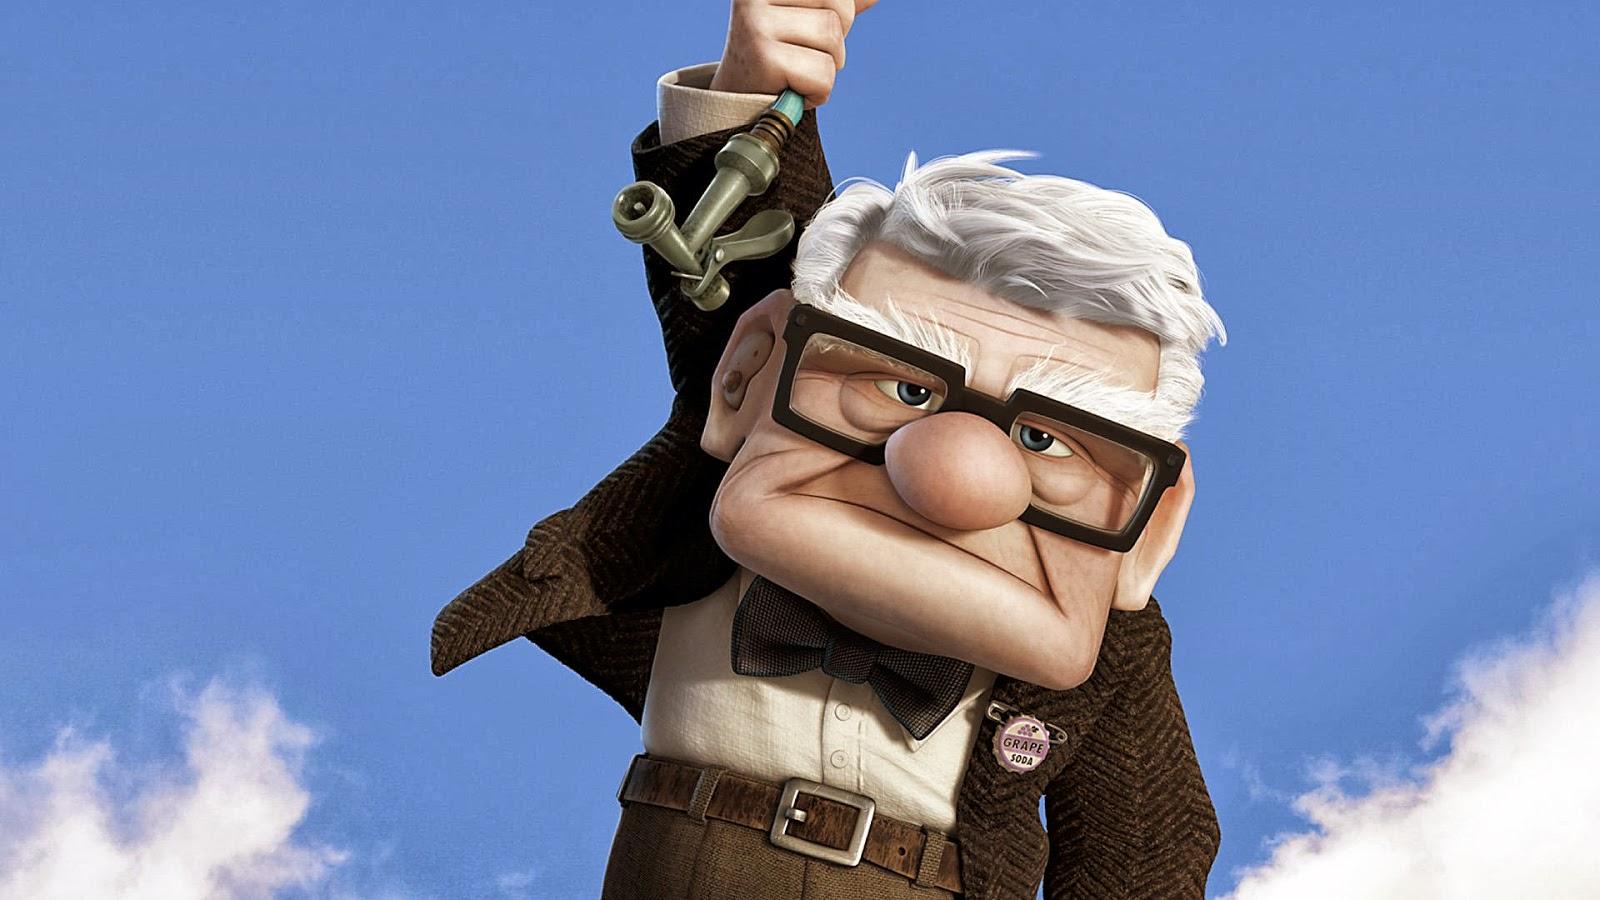 Pixar Up Movie | Full HD Desktop Wallpapers 1080p